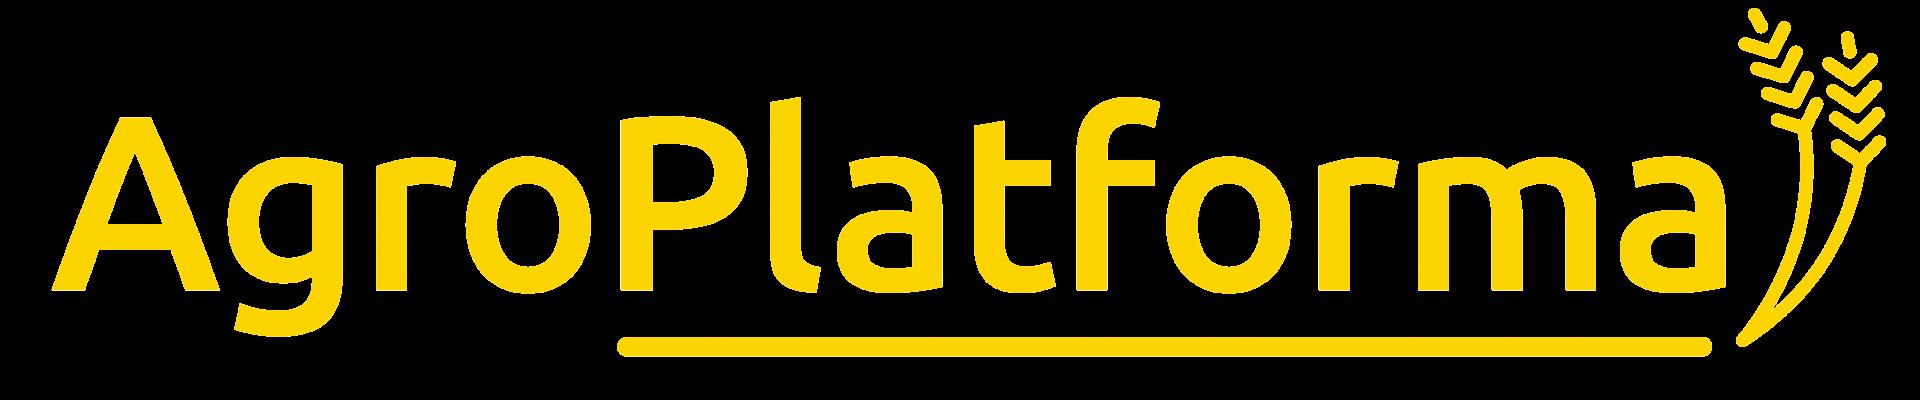 AgroPlatforma